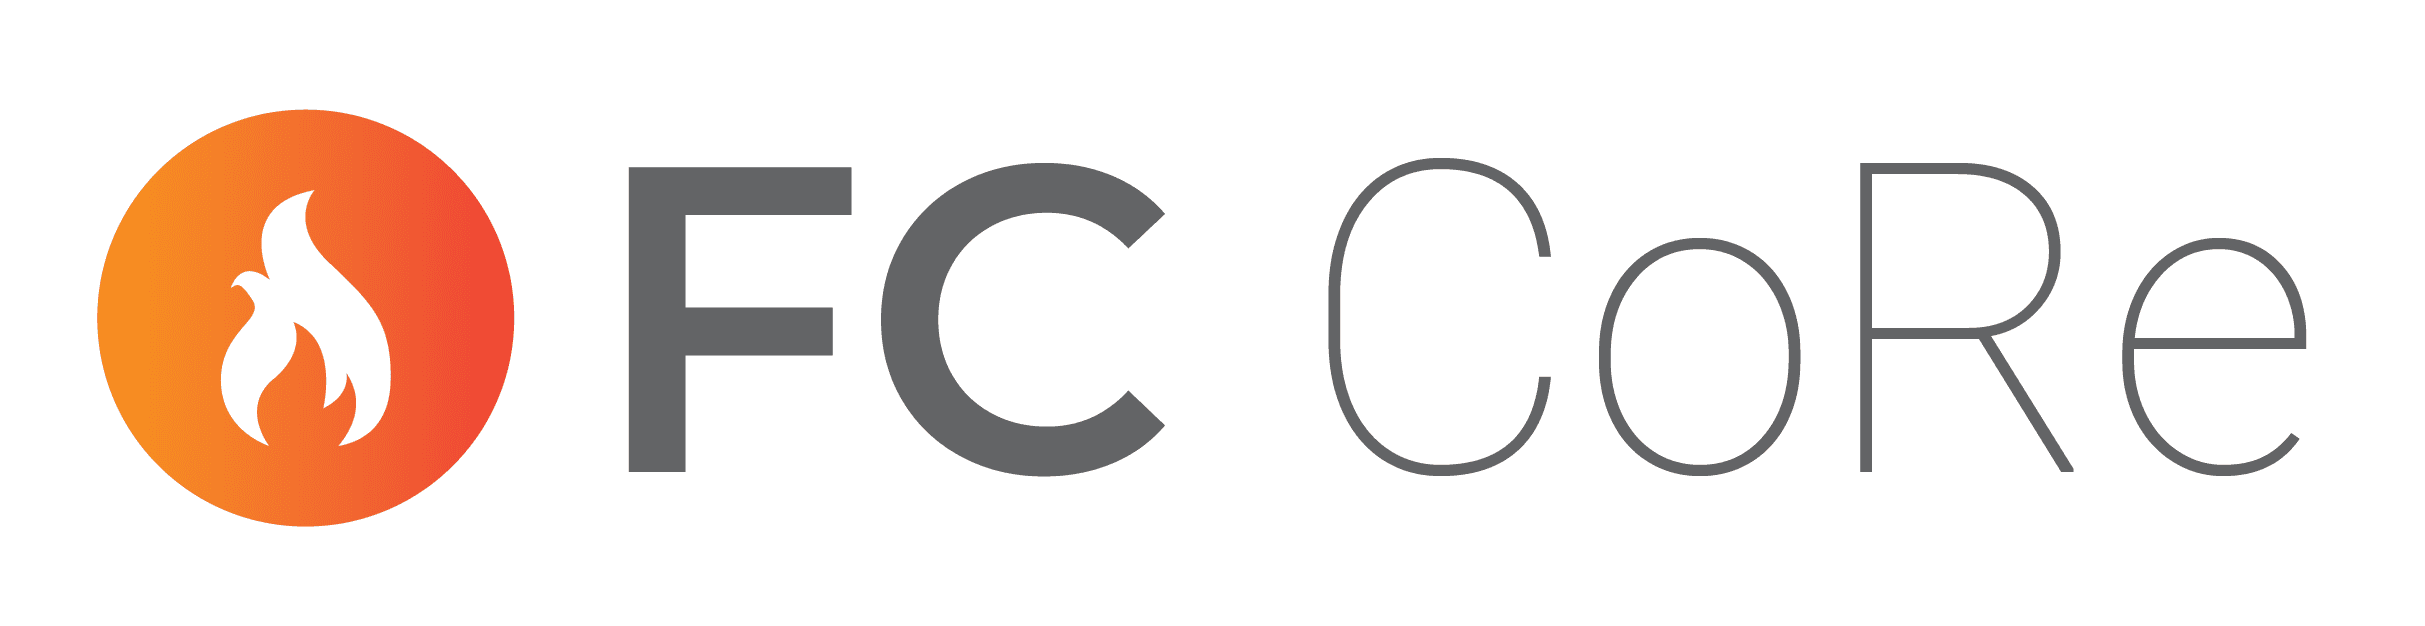 Fuel Cycle Logo: FC CoRe